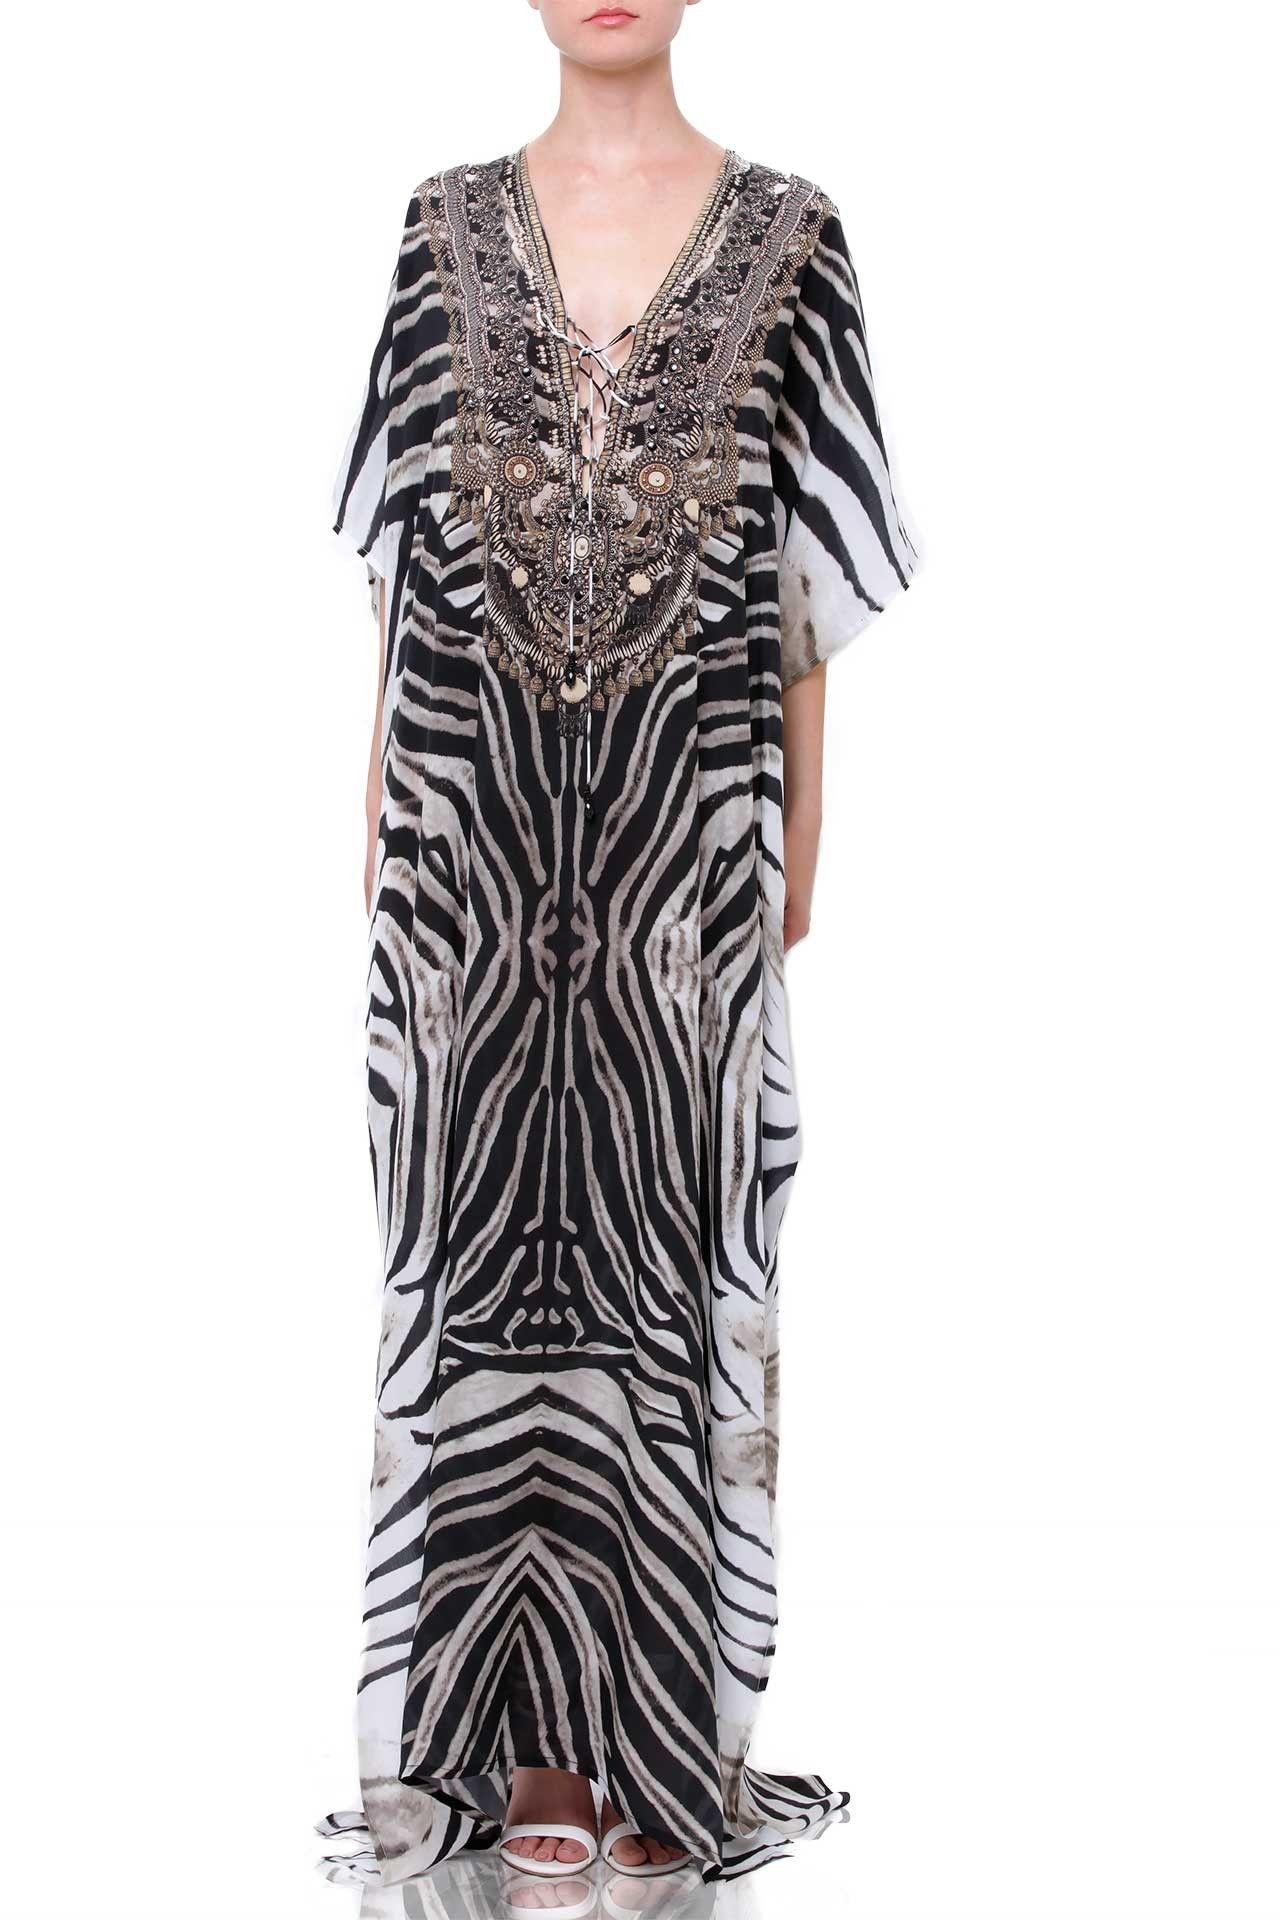 Black and White Printed Long Kaftan Dress in Stripes